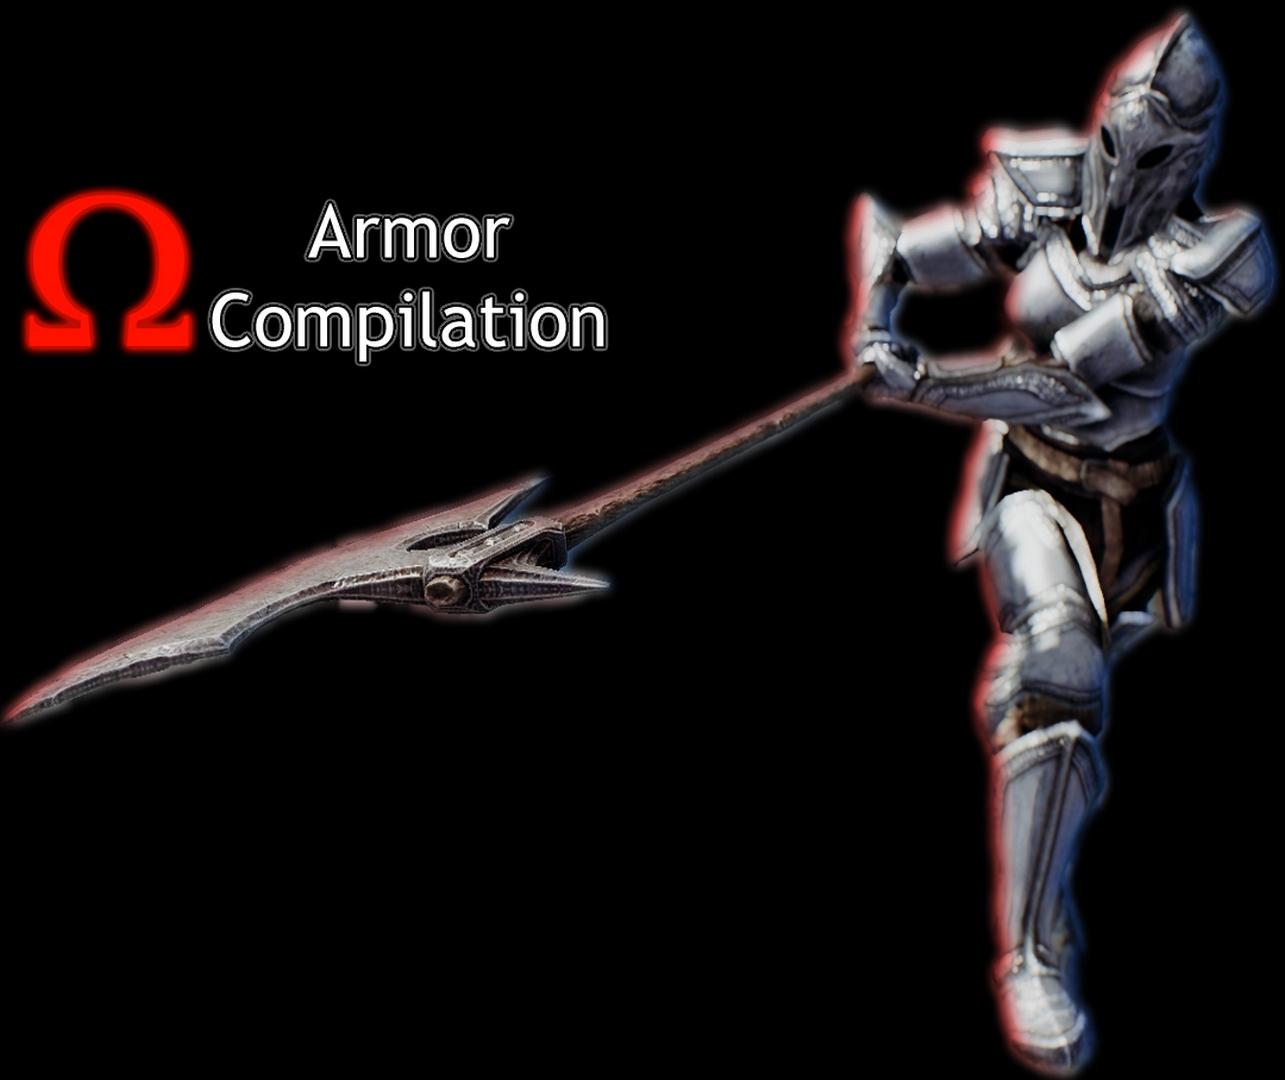 Armor_Compilation.jpg